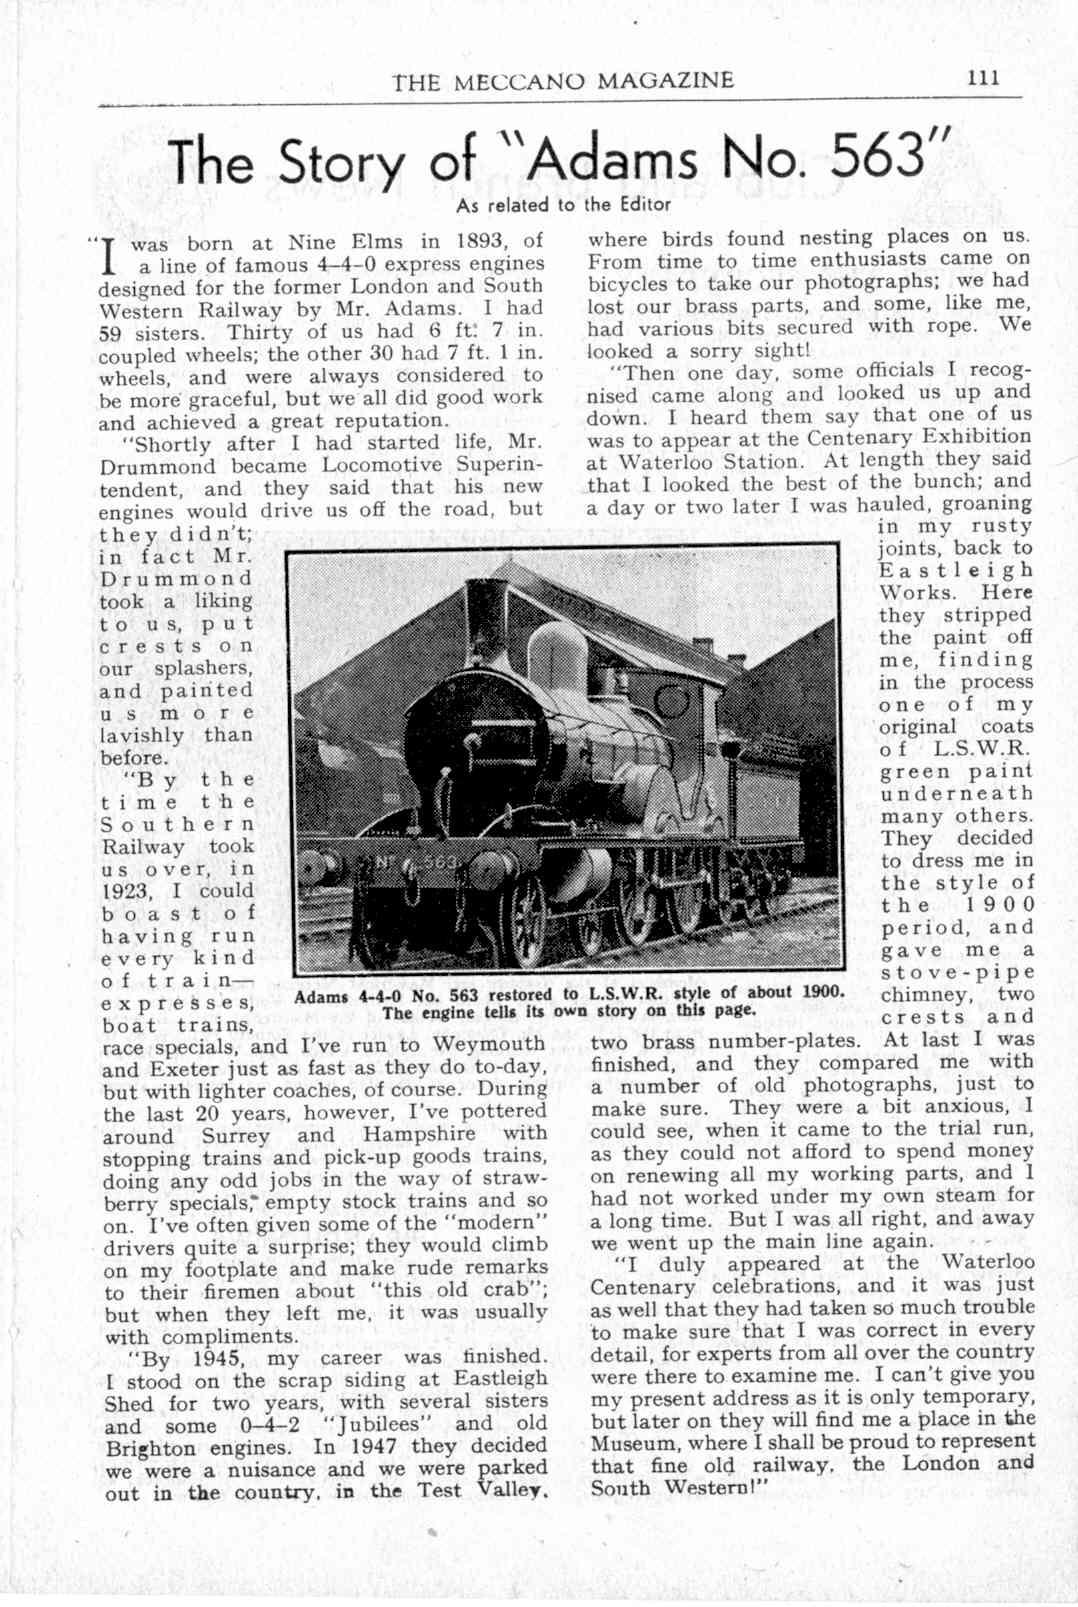 UK Meccano Magazine March 1949 Page 111